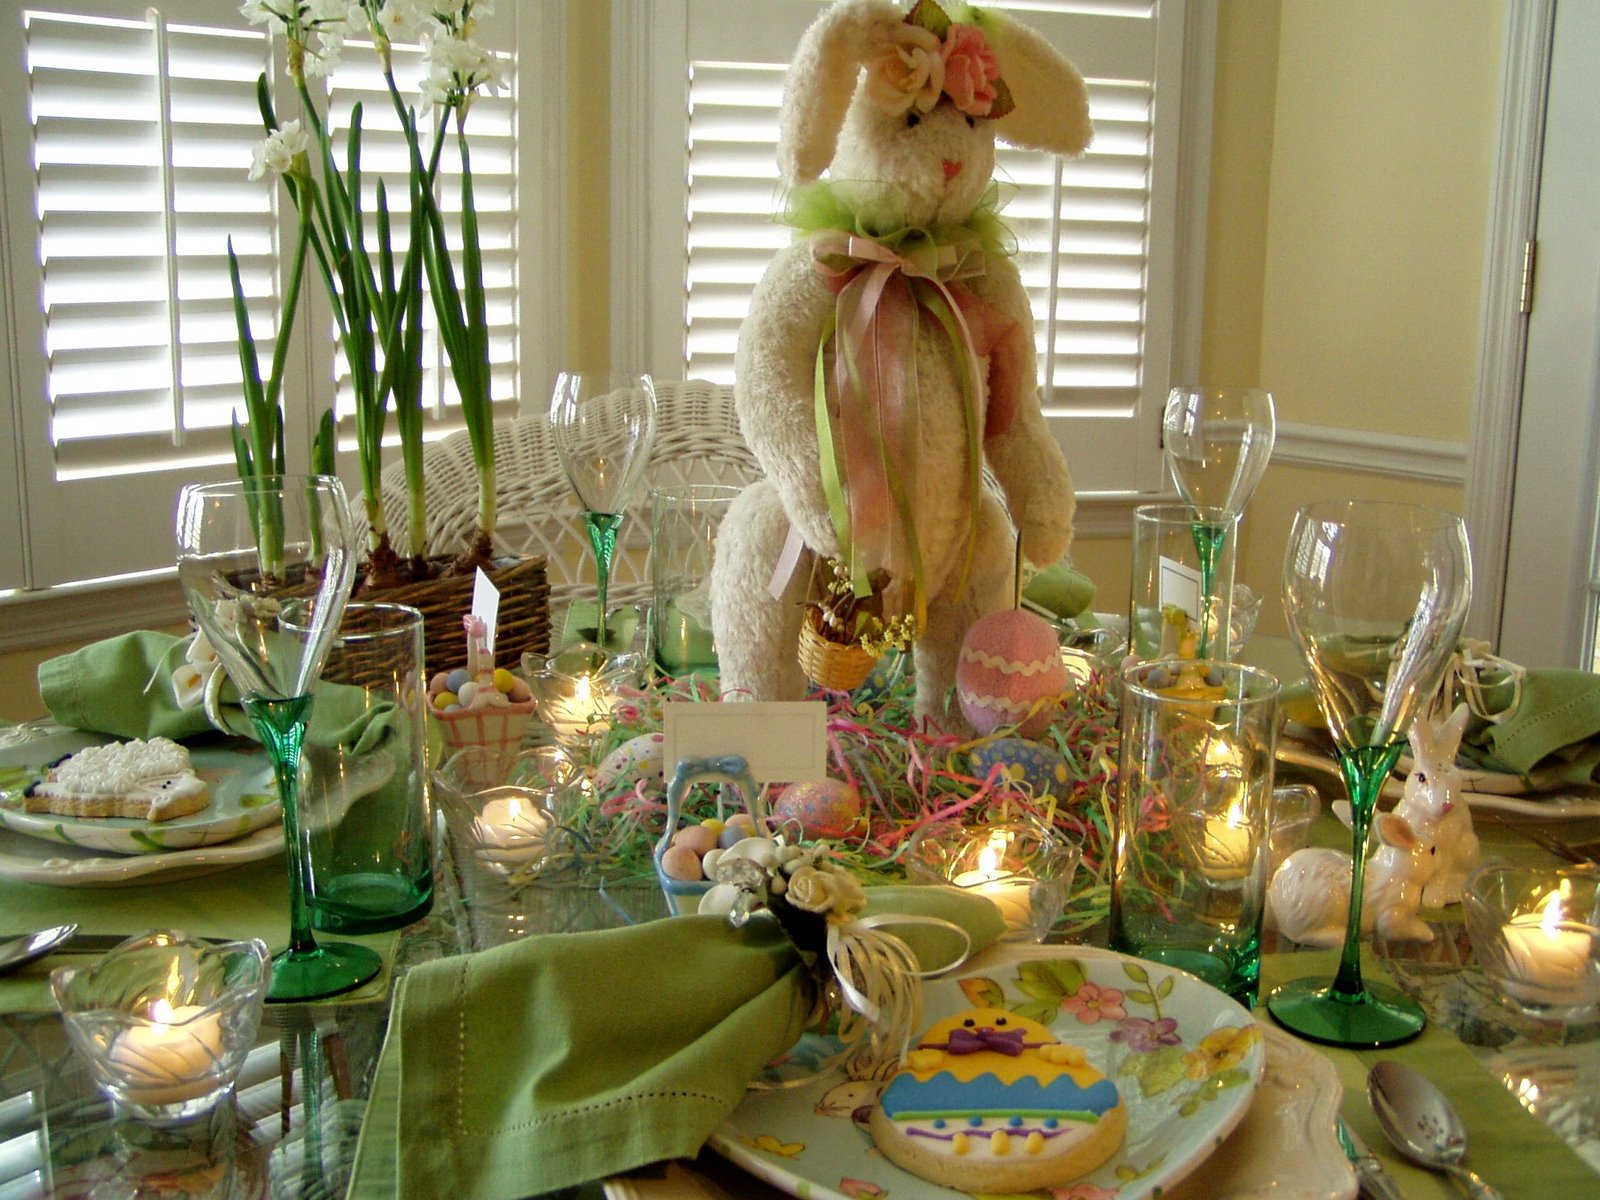 easter table settings pinterest - castrophotos